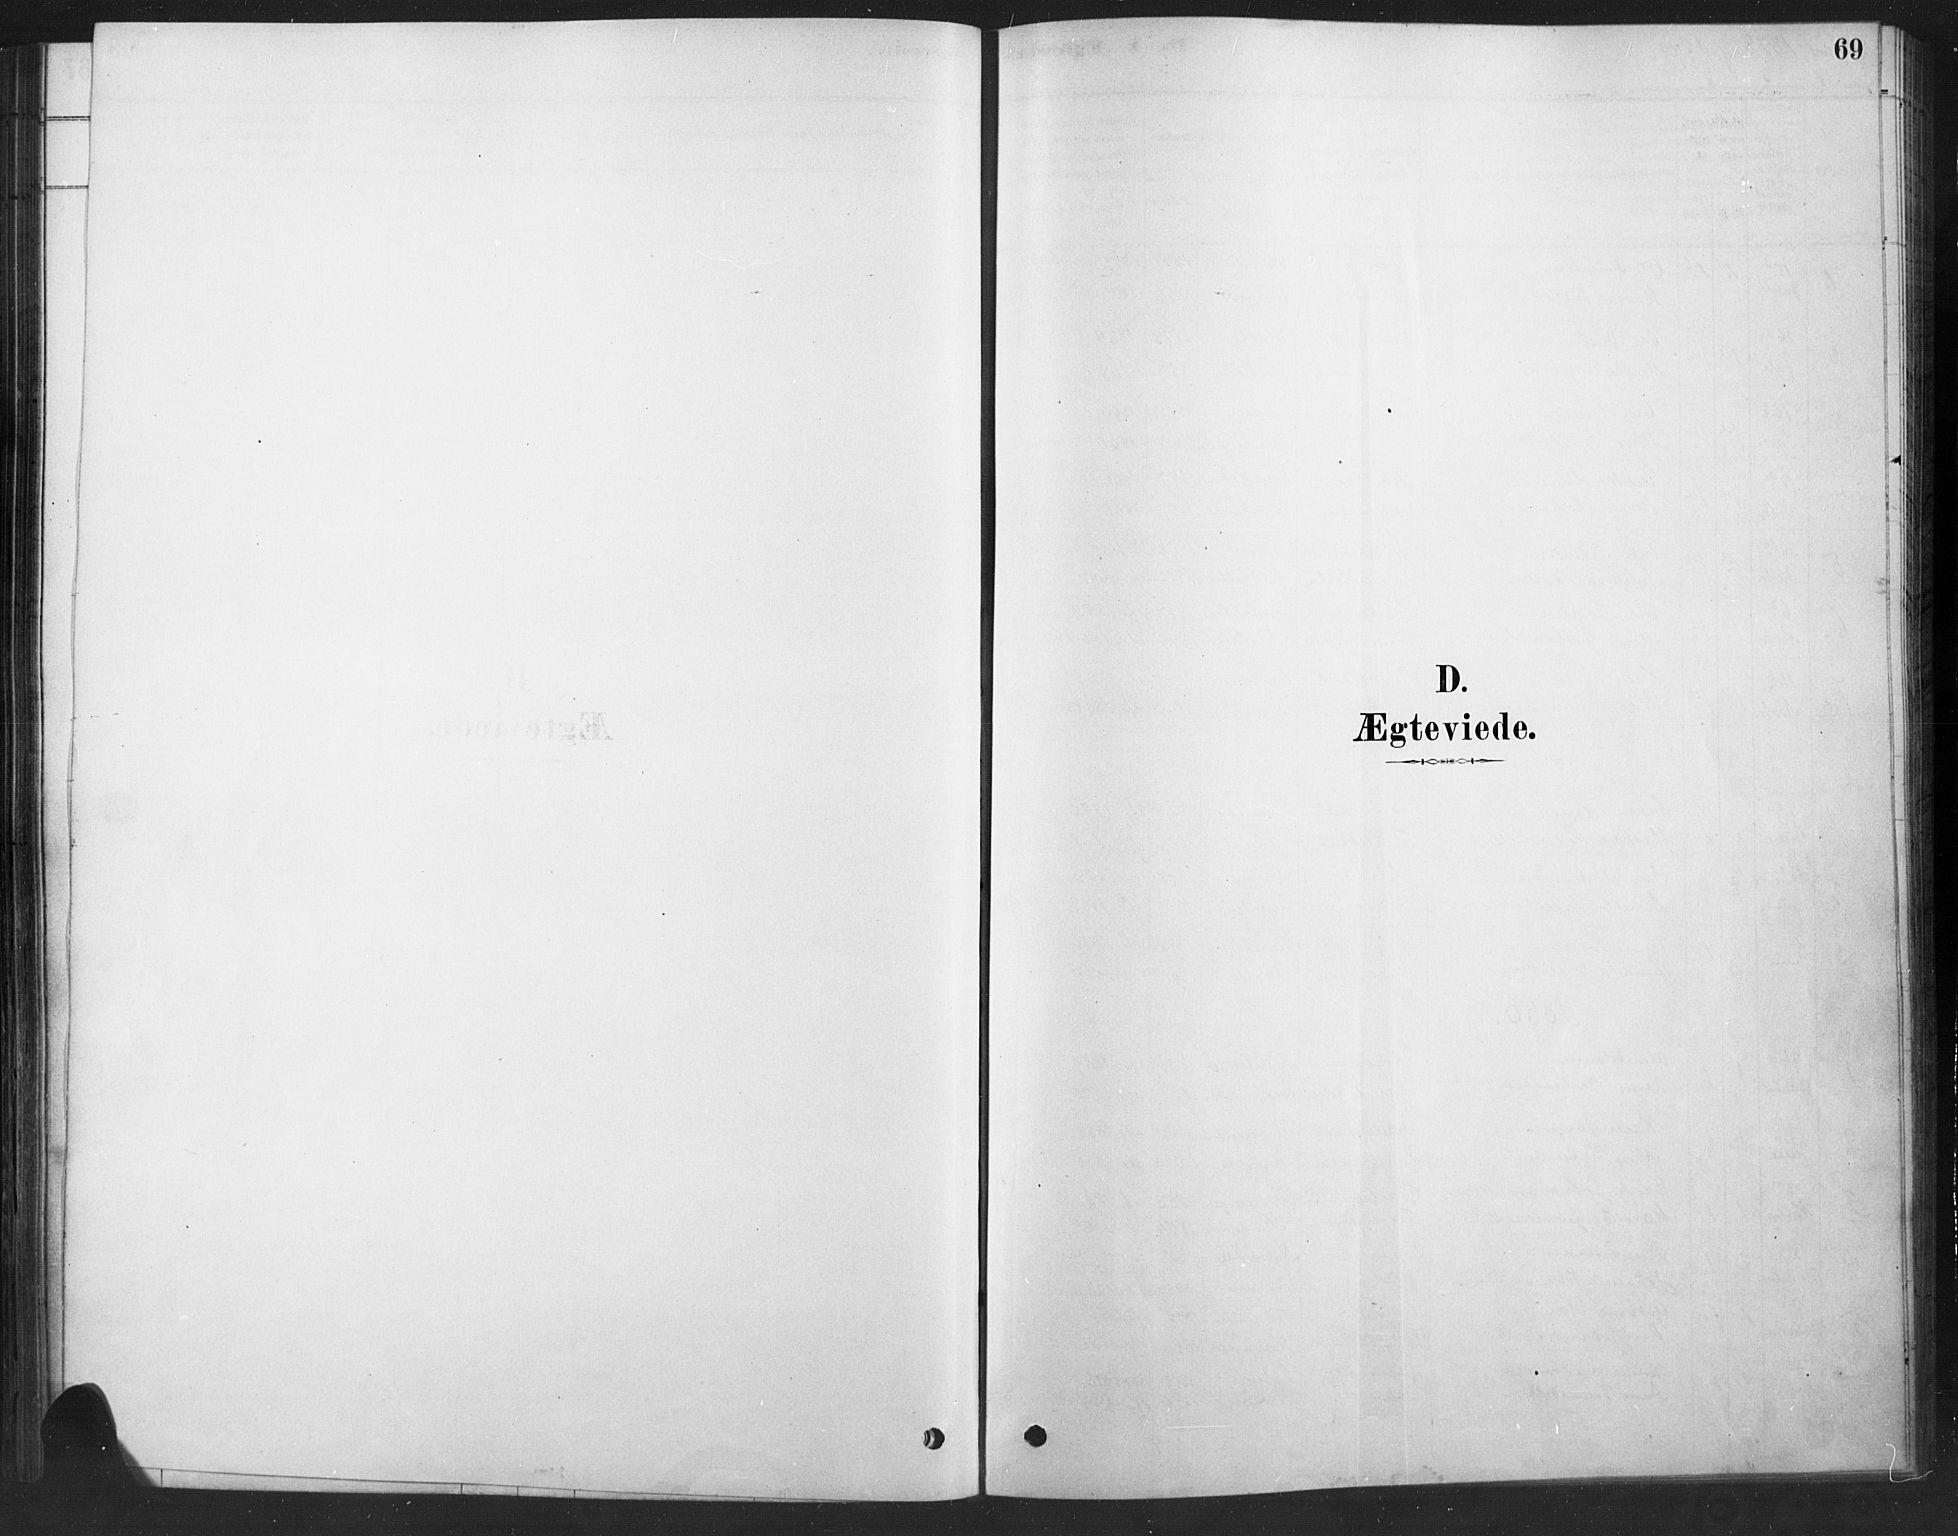 SAH, Ringebu prestekontor, Ministerialbok nr. 10, 1878-1898, s. 69